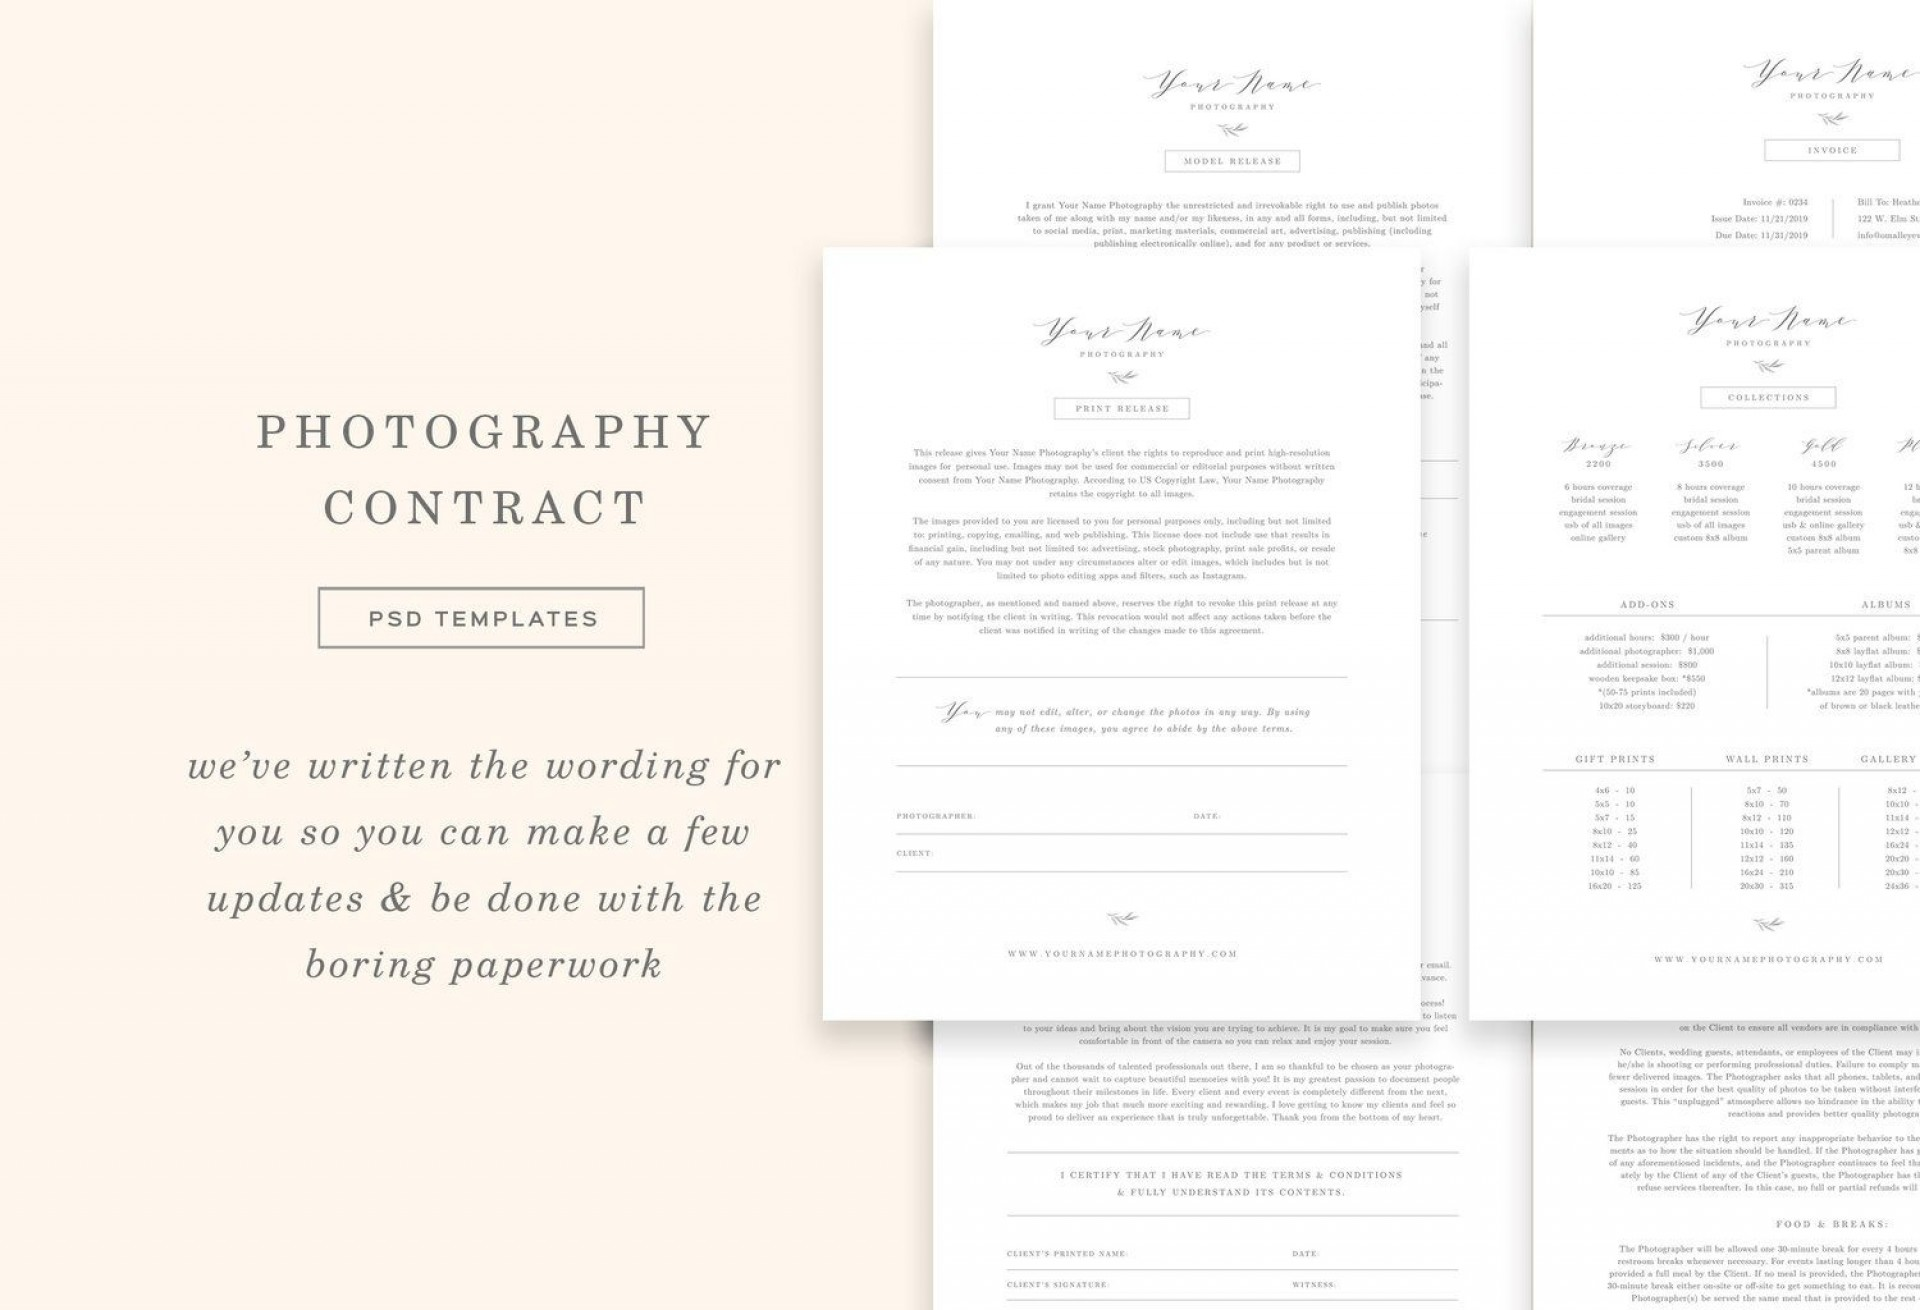 009 Astounding Wedding Photography Contract Template Canada High Resolution 1920